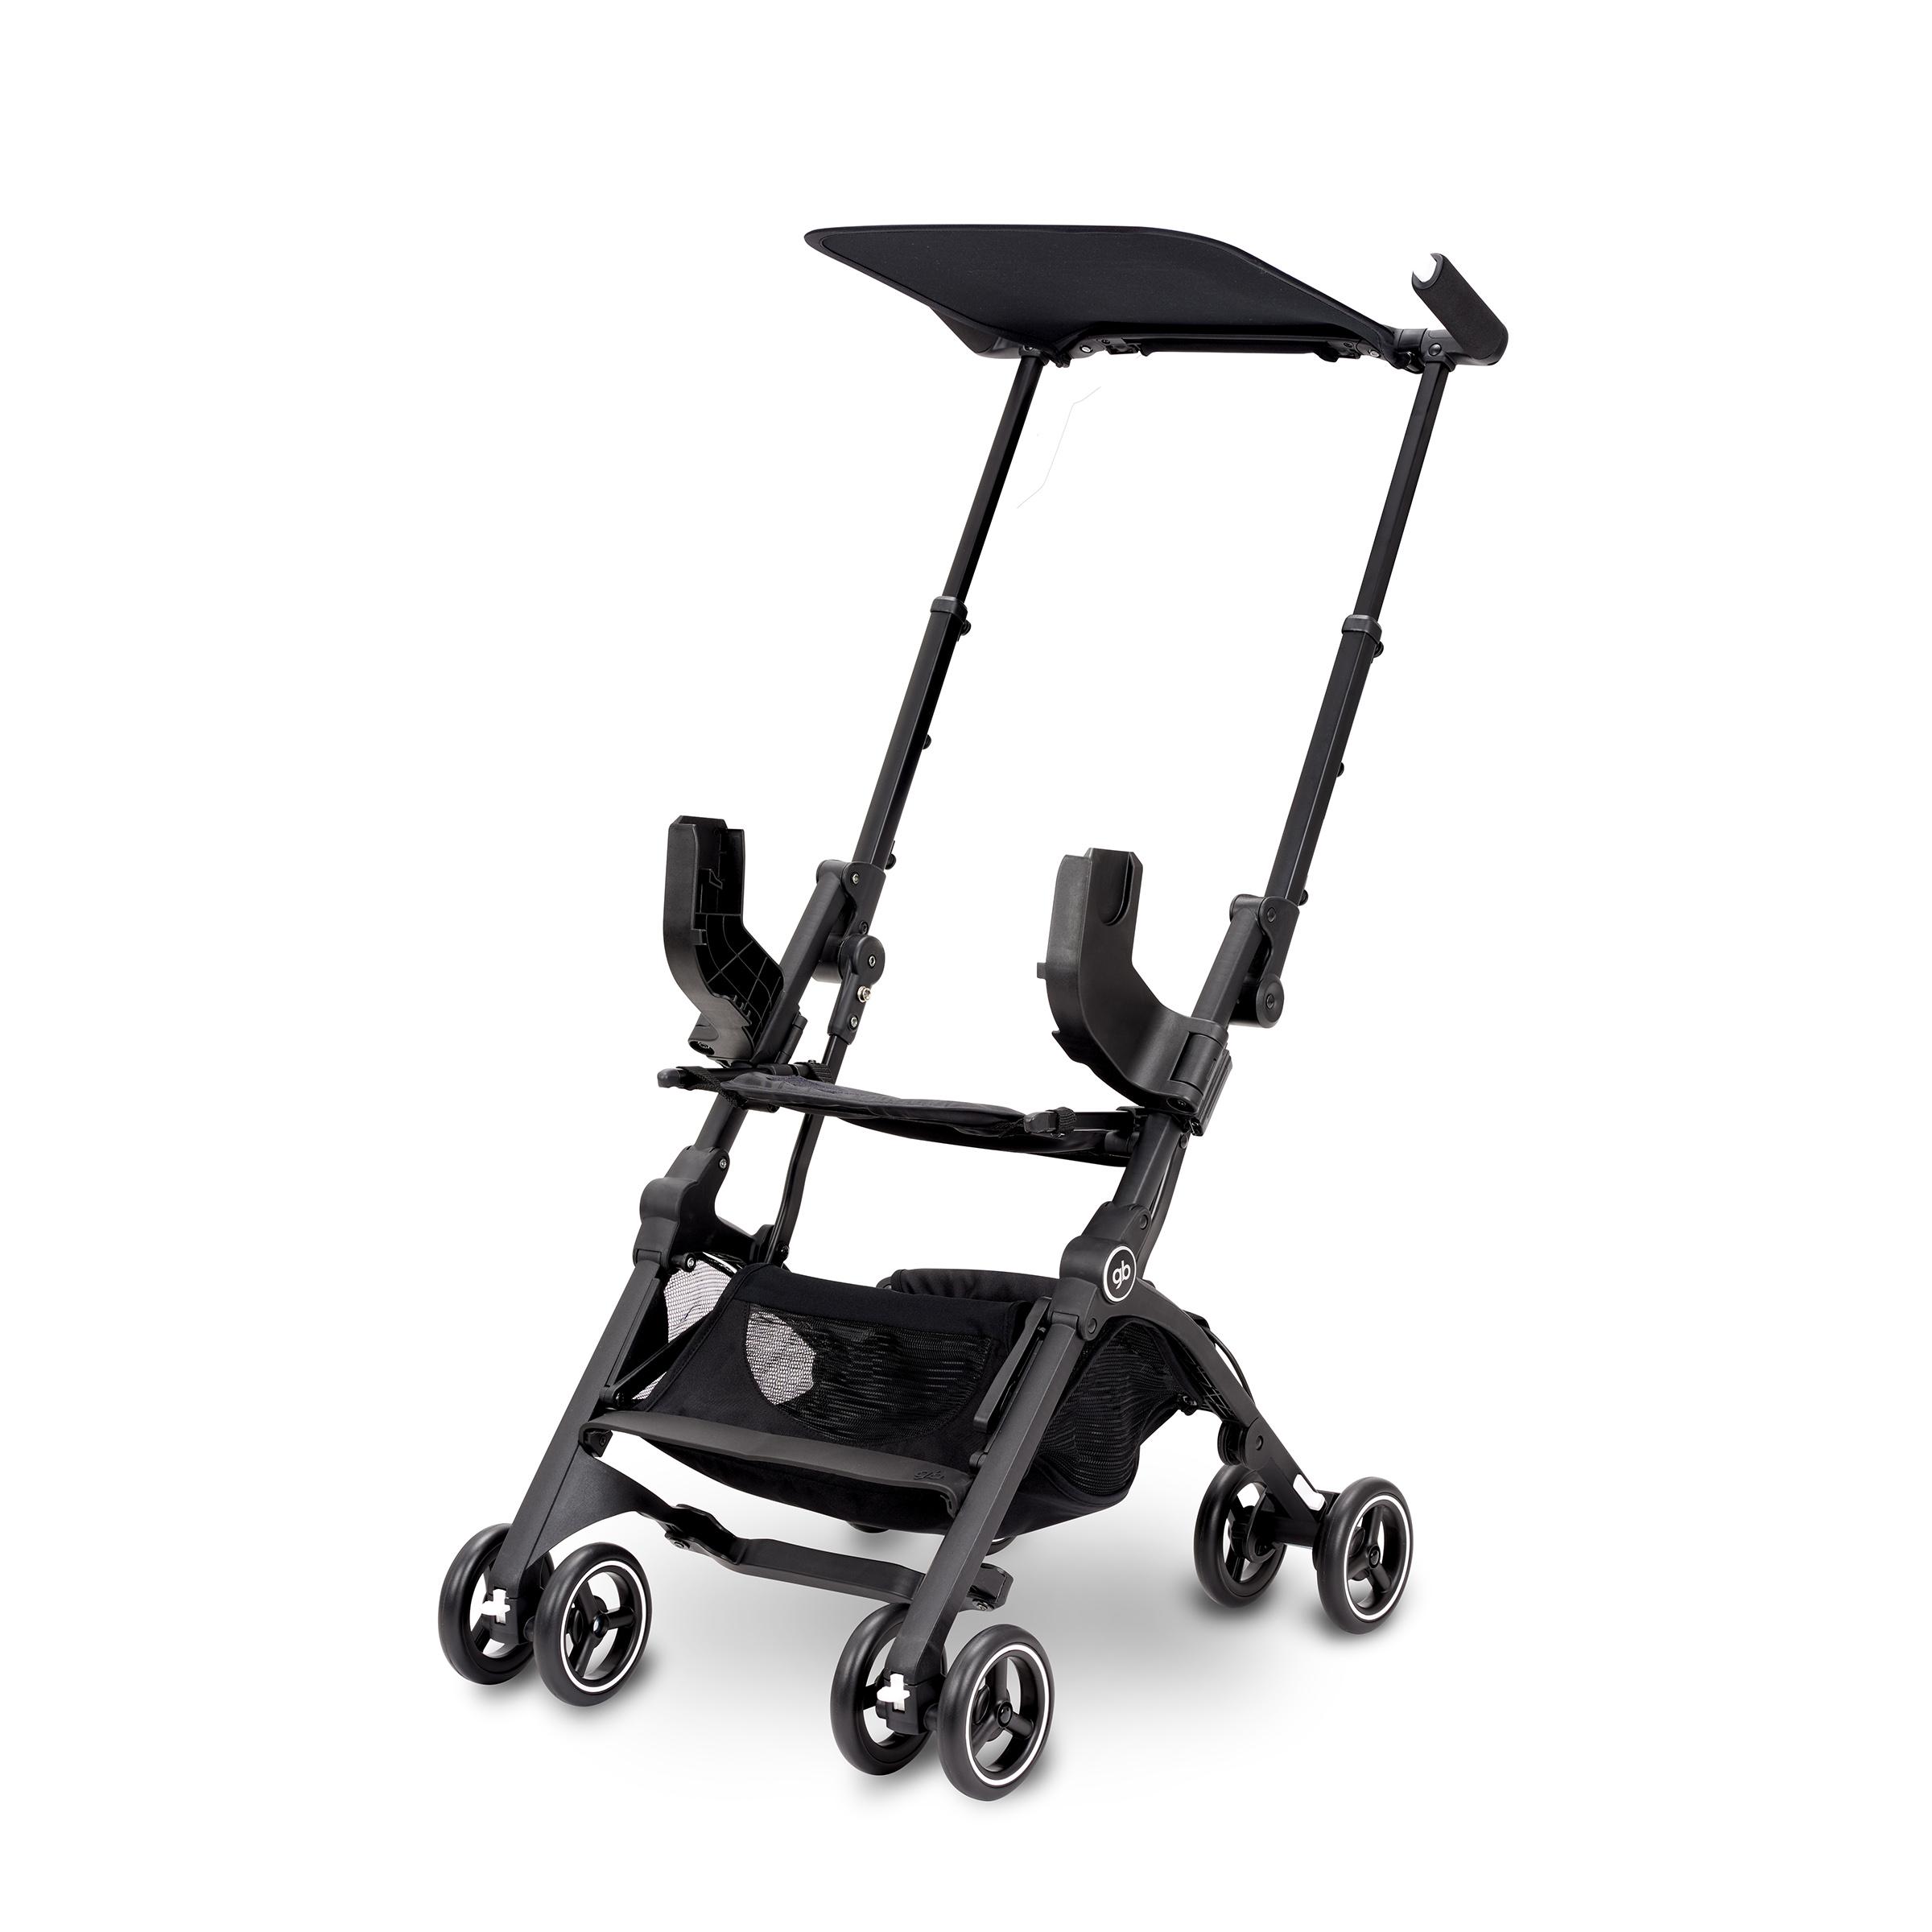 Pockit Go Lightweight Stroller Functions